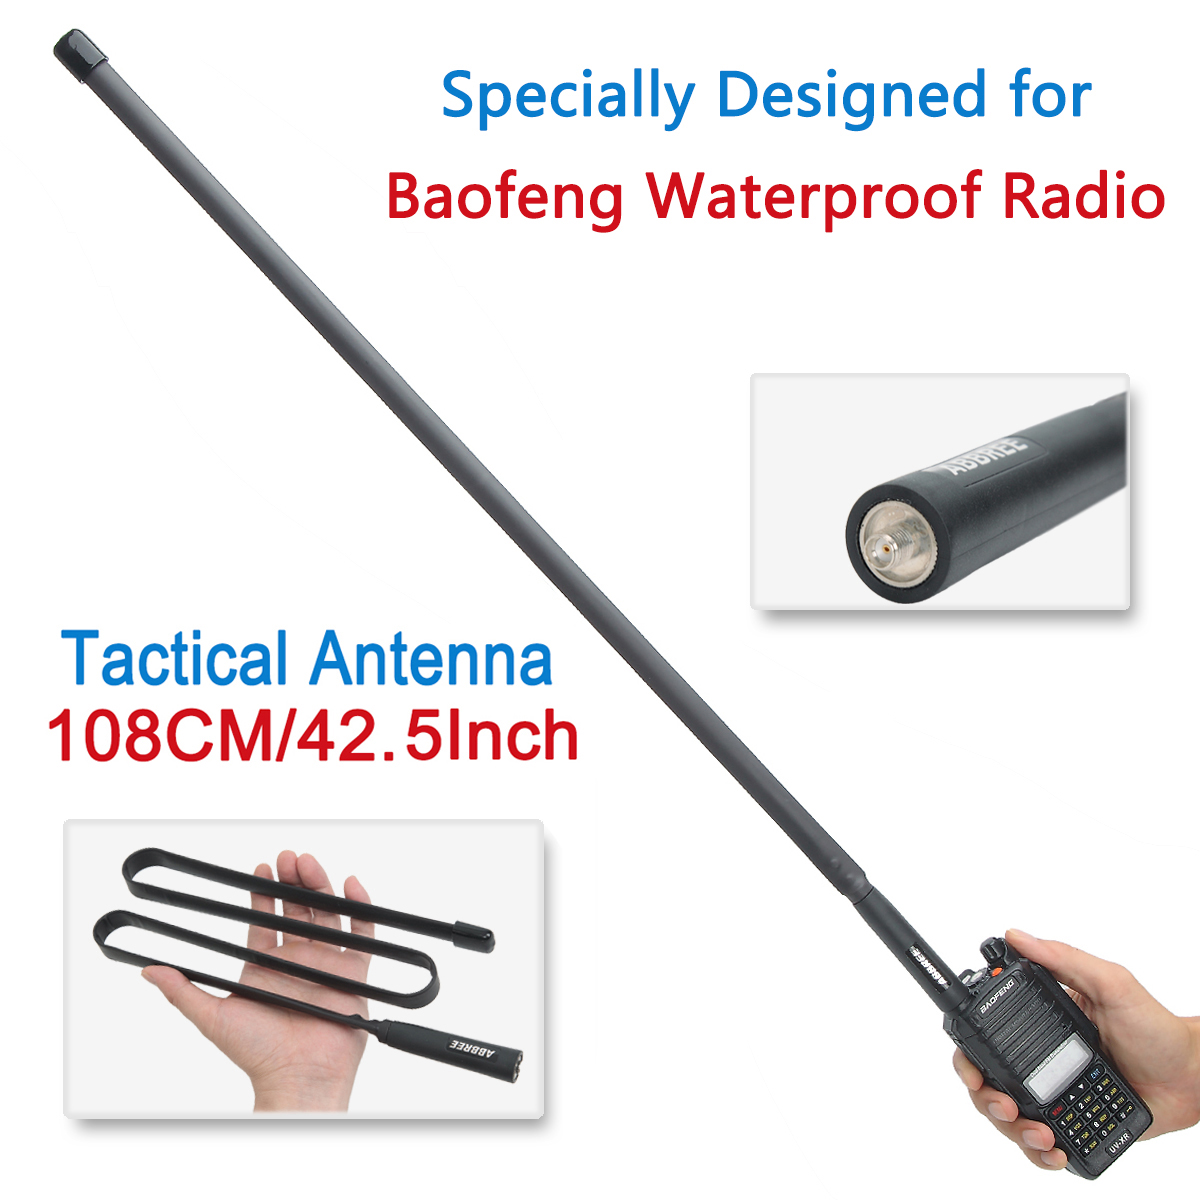 ABBREE AR-152 SMA-Женская VHF UHF тактическая антенна для Baofeng UV-9R Plus UV-XR BF-9700 Водонепроницаемая рация Двусторонняя радиосвязь